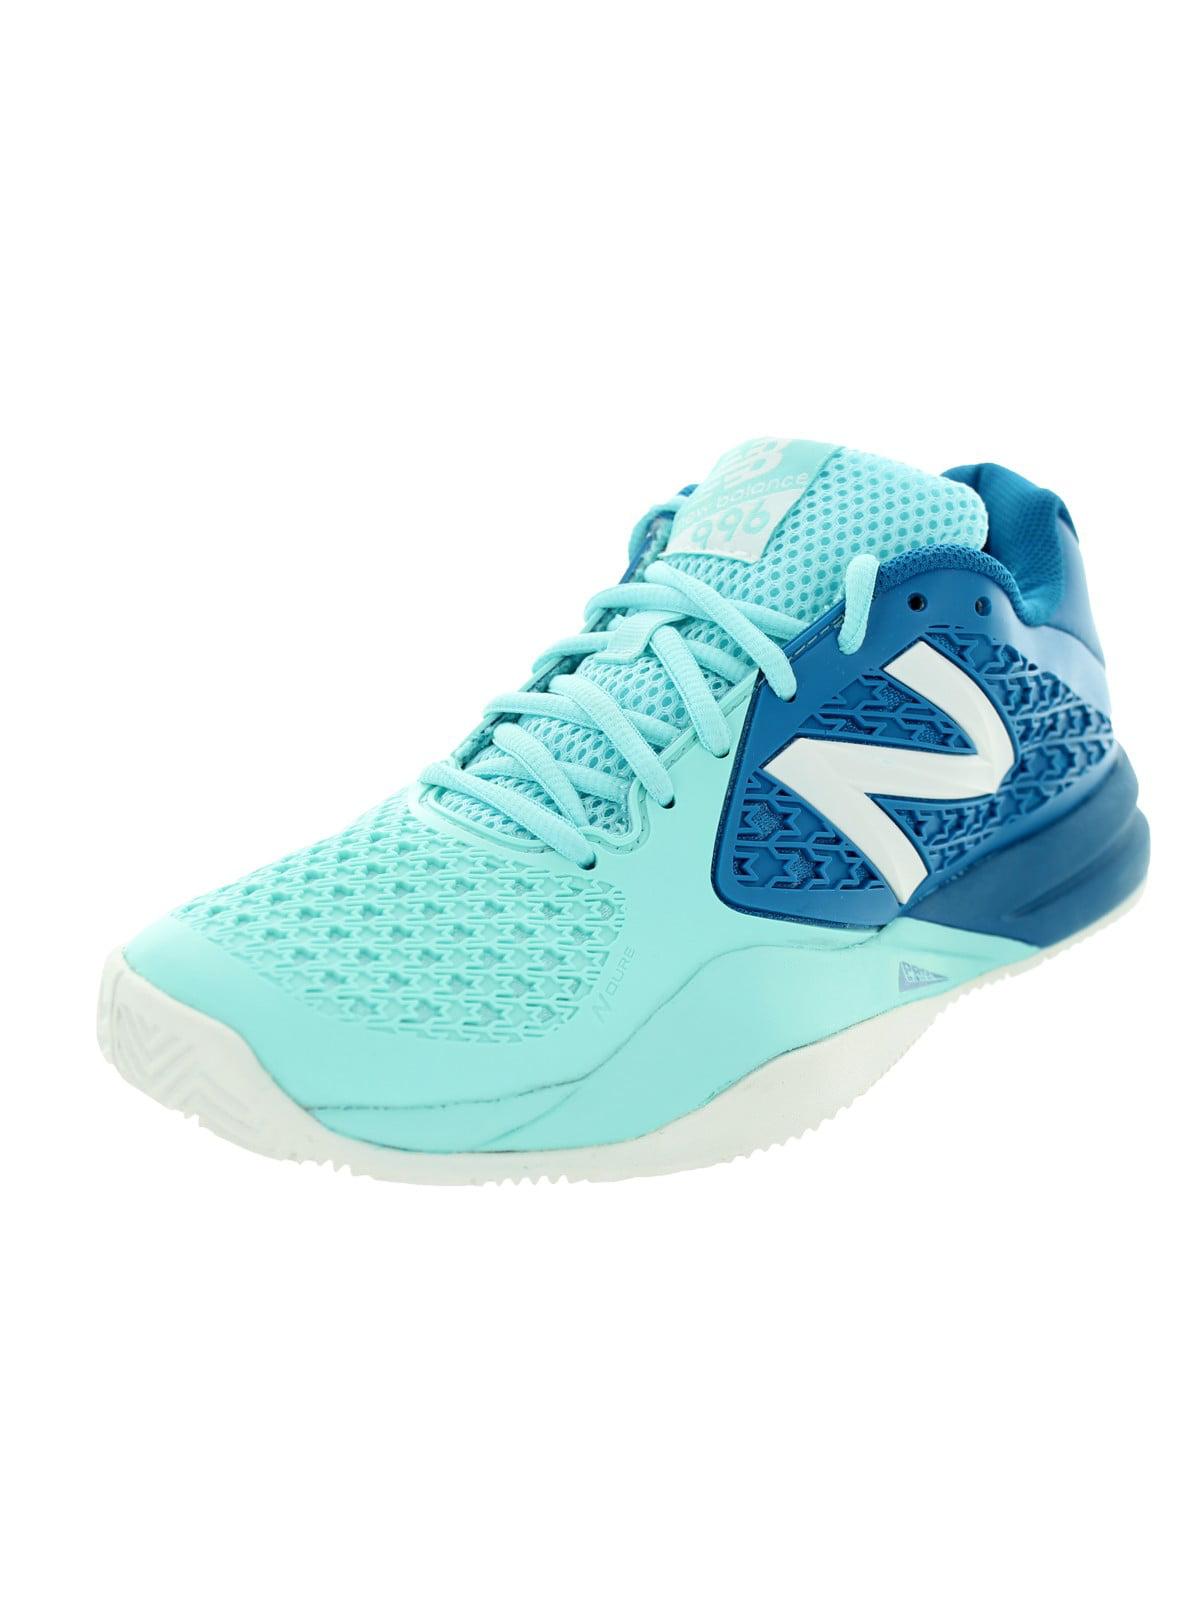 Tennisschuhe New Balance Womens 996v2 Tennis Shoe heres.ai